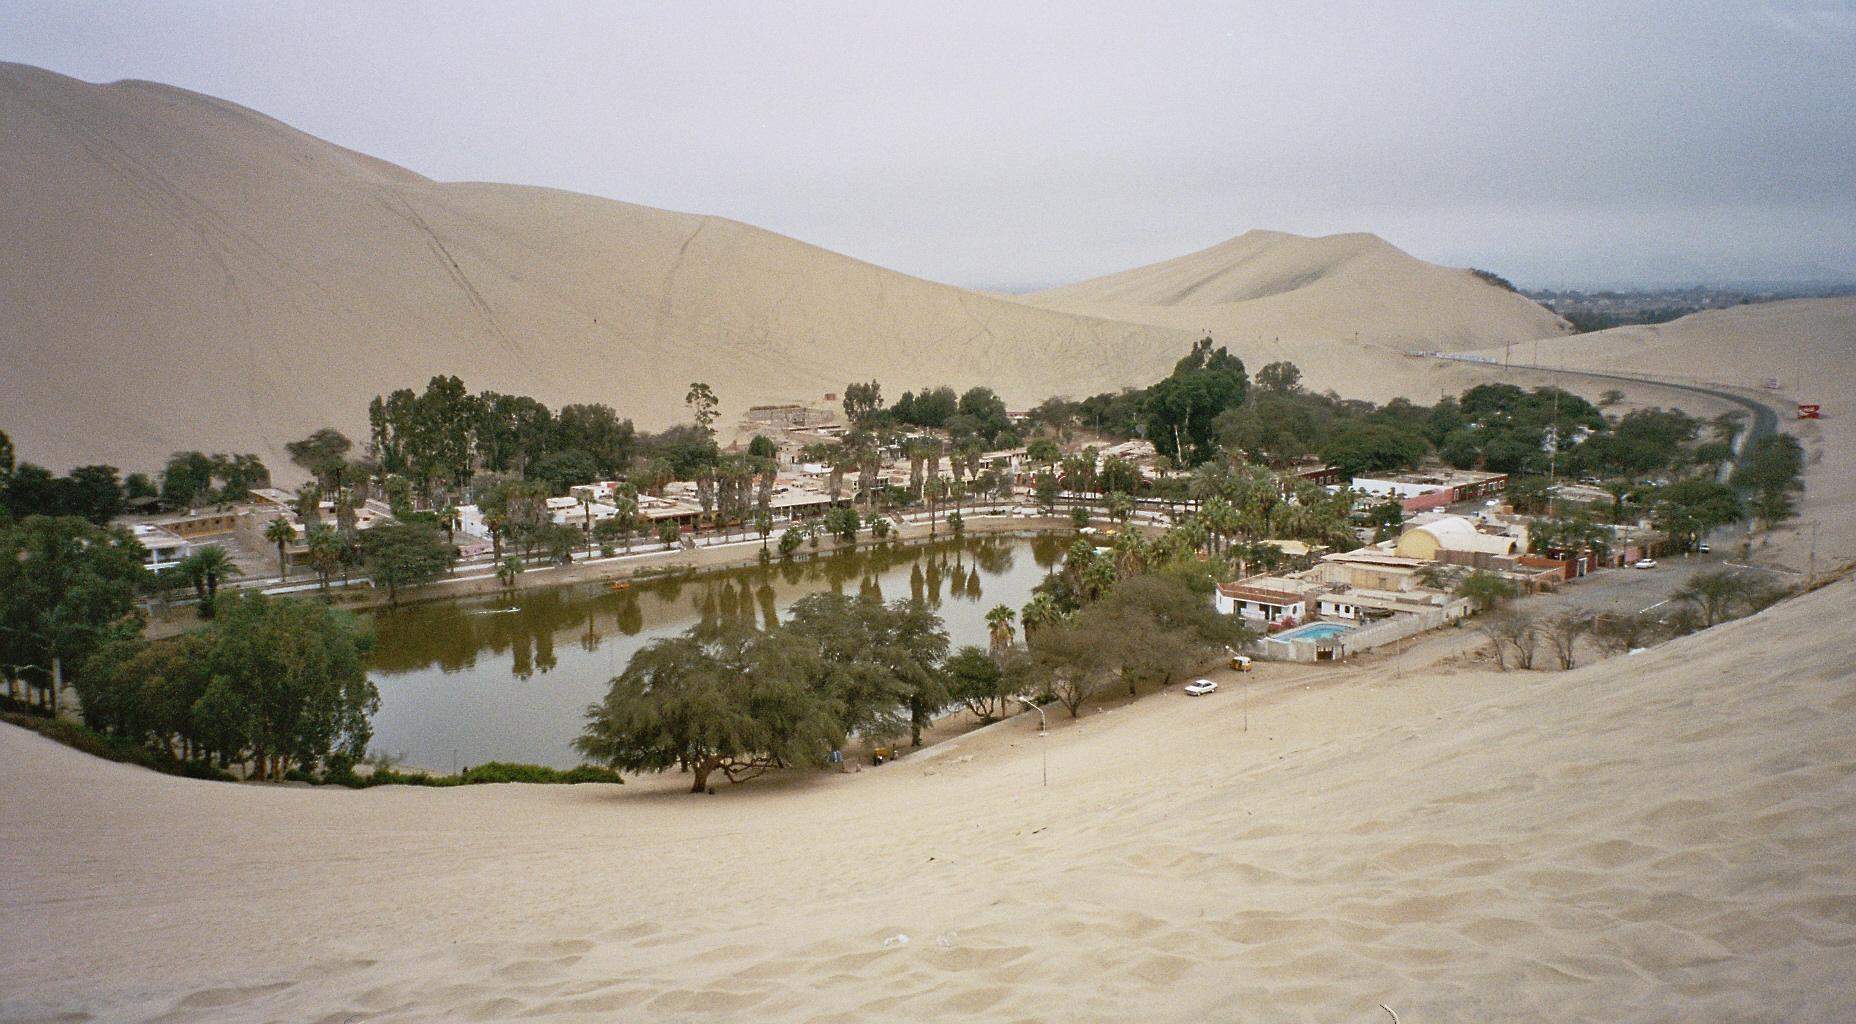 Bagaikan oase di tengah padang gurun, melegakan dan menghidupkan....